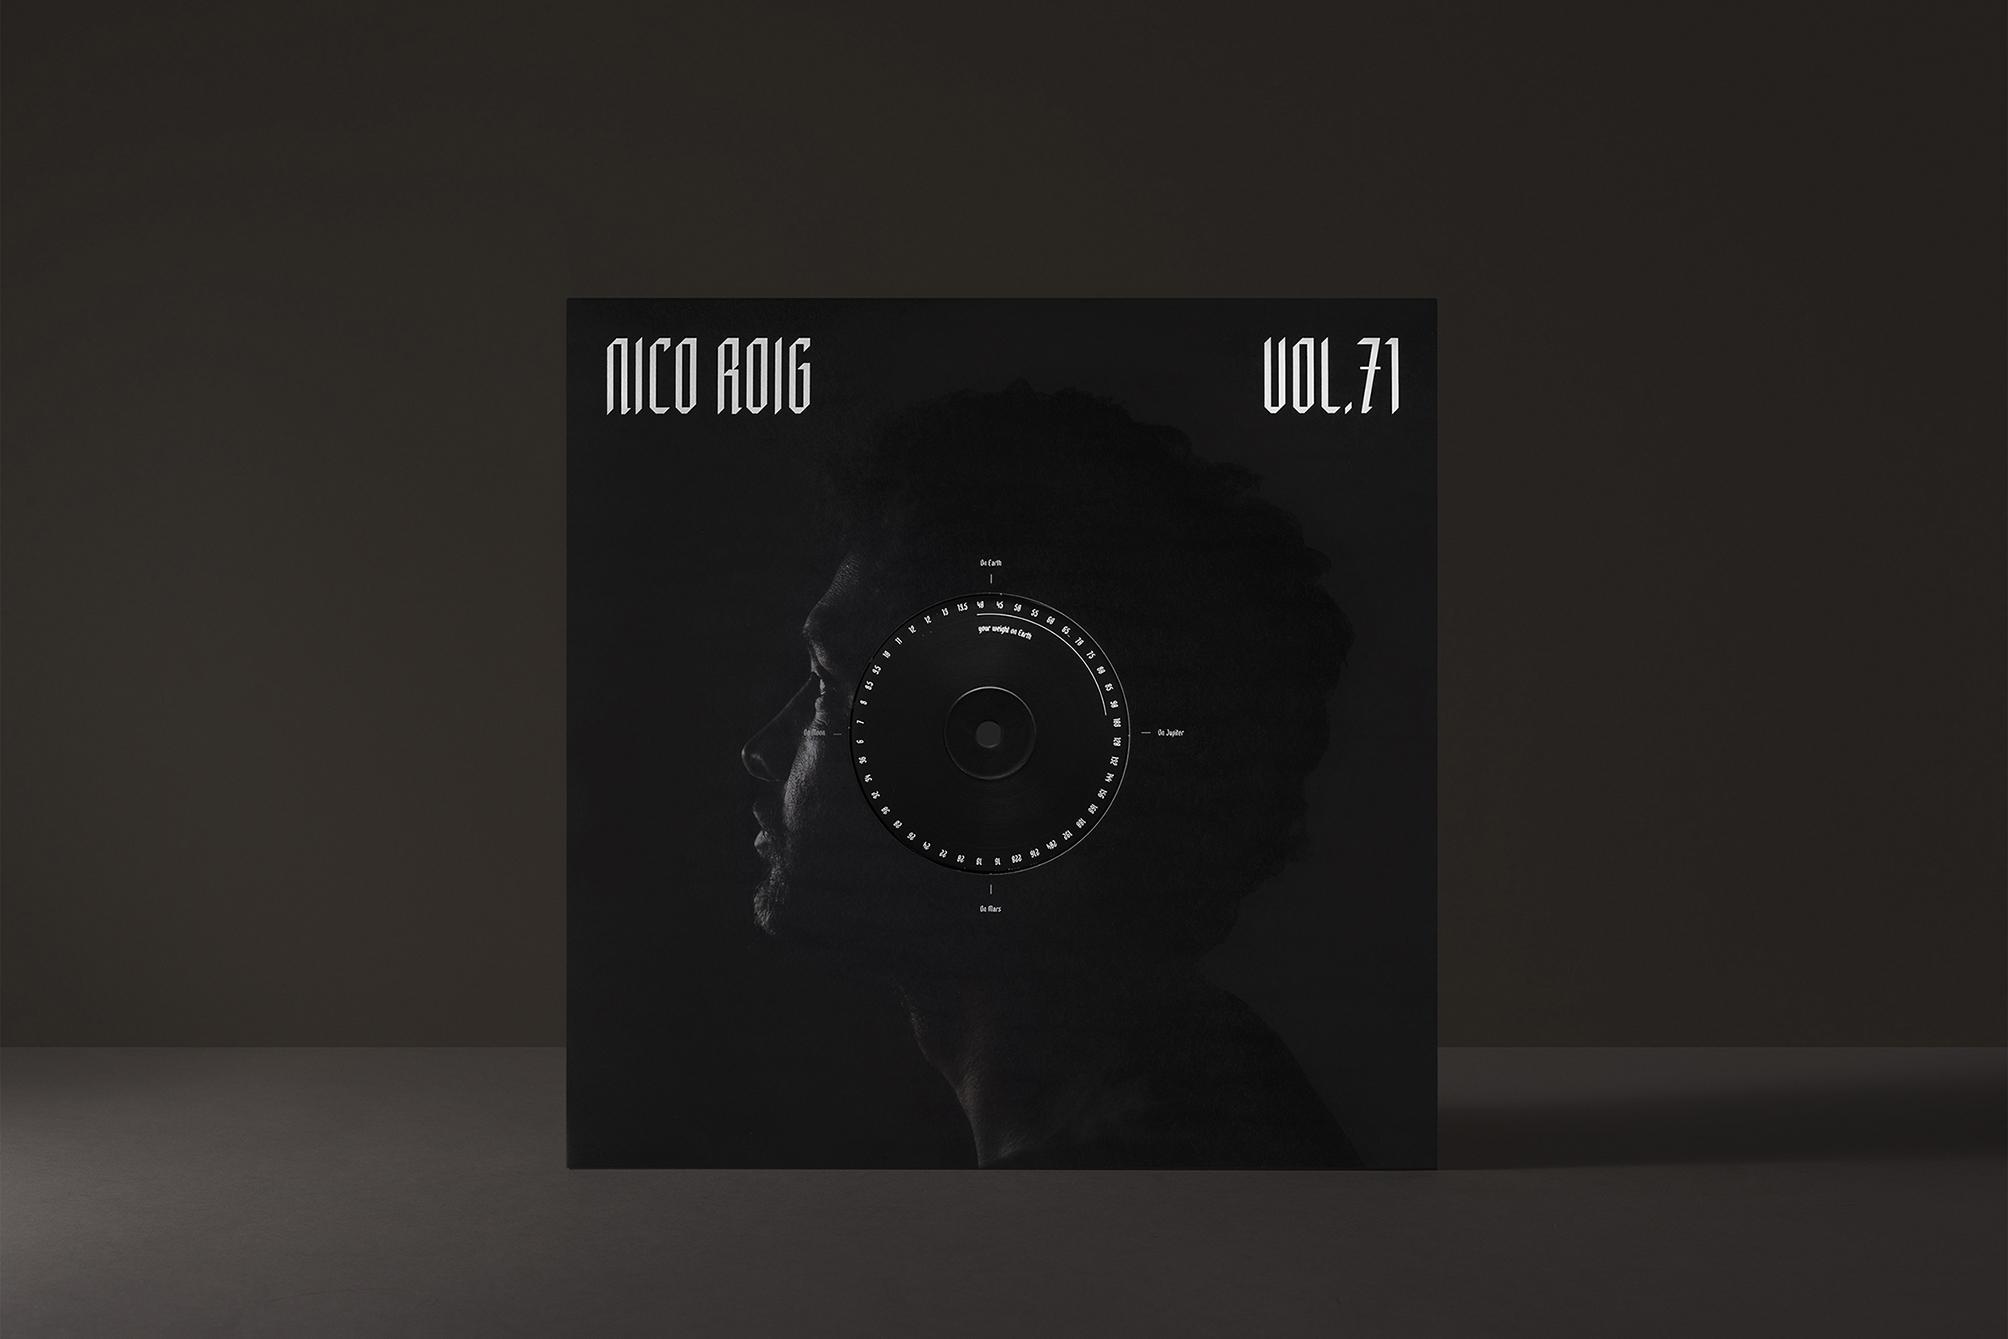 Nico Roig Vol 71 by Ingrid Picanyol - Creative Work - $i